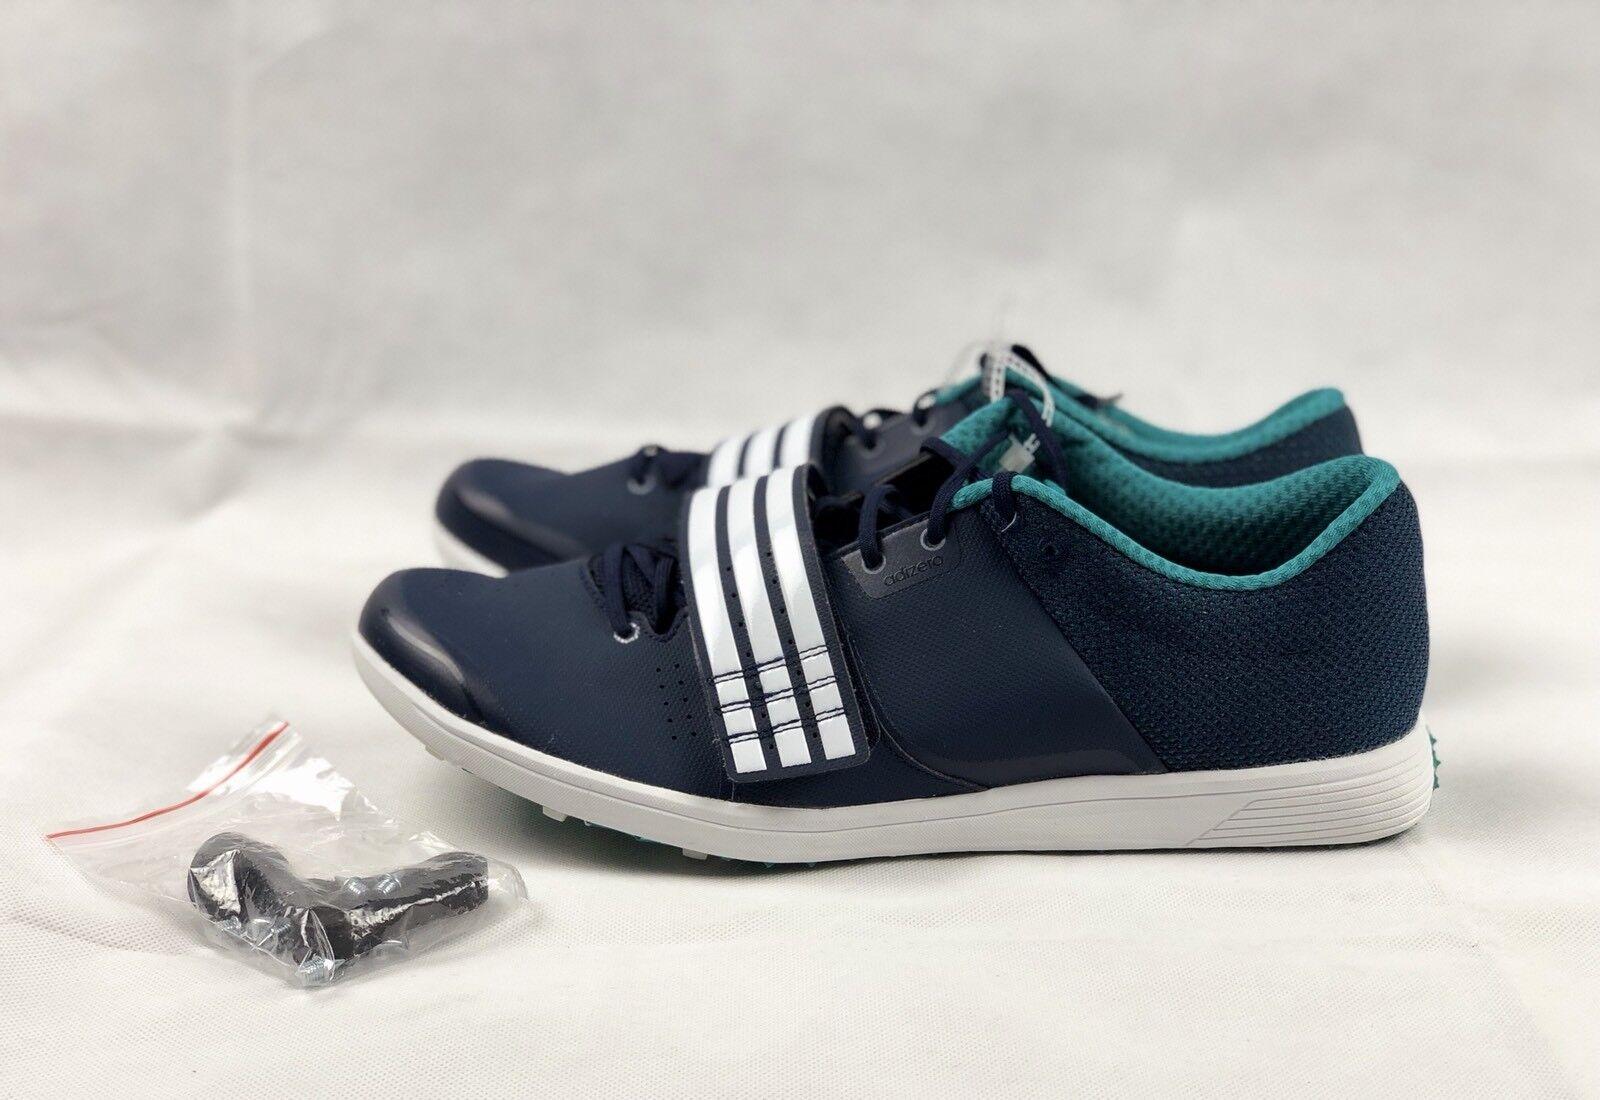 Adidas Performance Adizero TJ/PV Triple Jump Pole Vault Sz 12.5 AF5664 Brand discount